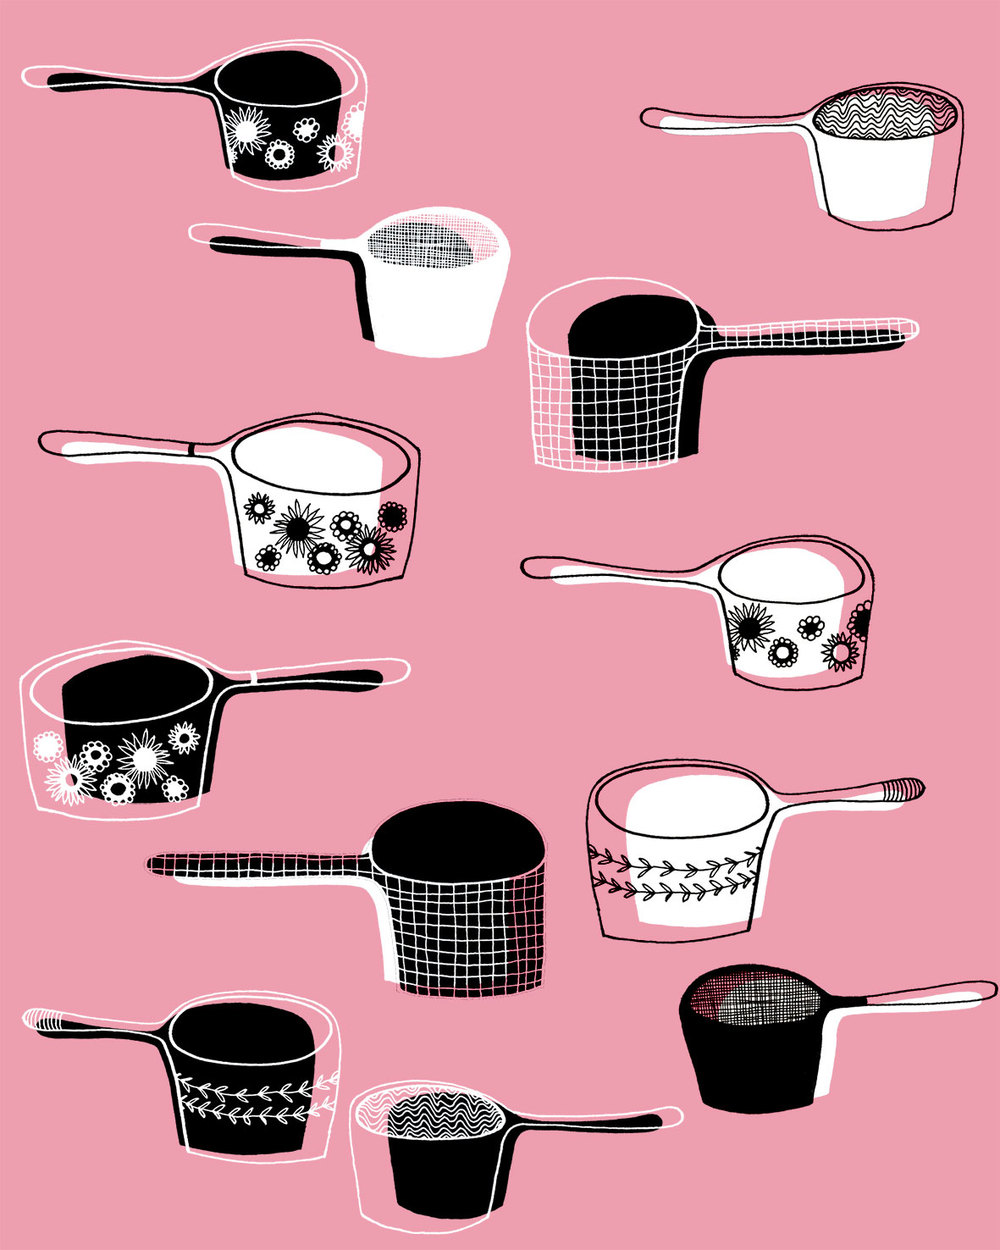 Pasta & pyres - bolt fabric design